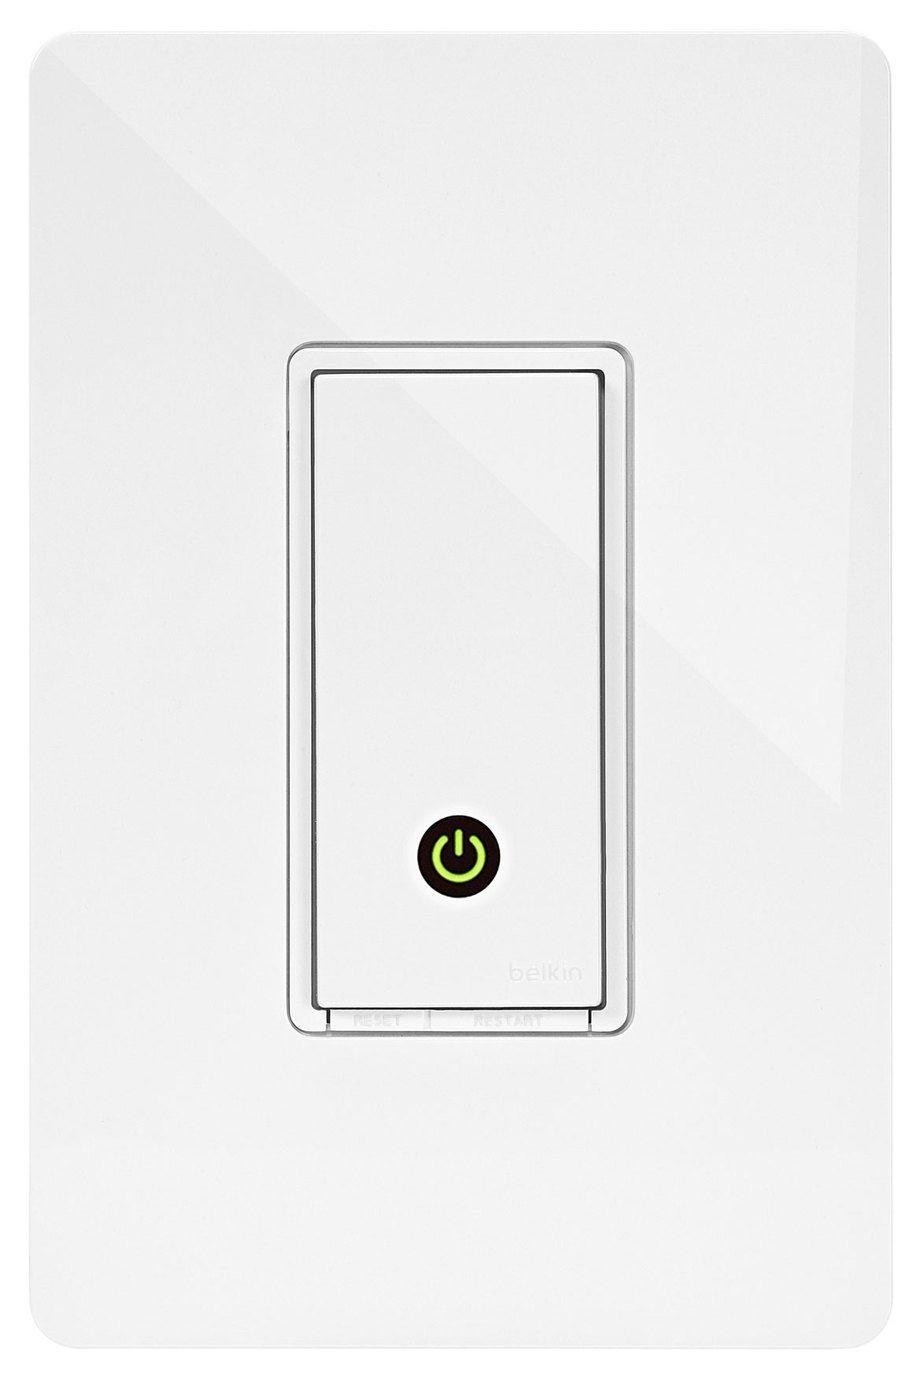 Belkin   F7C030au WeMo Light Switch   Myer Online   DIY DECOR ...